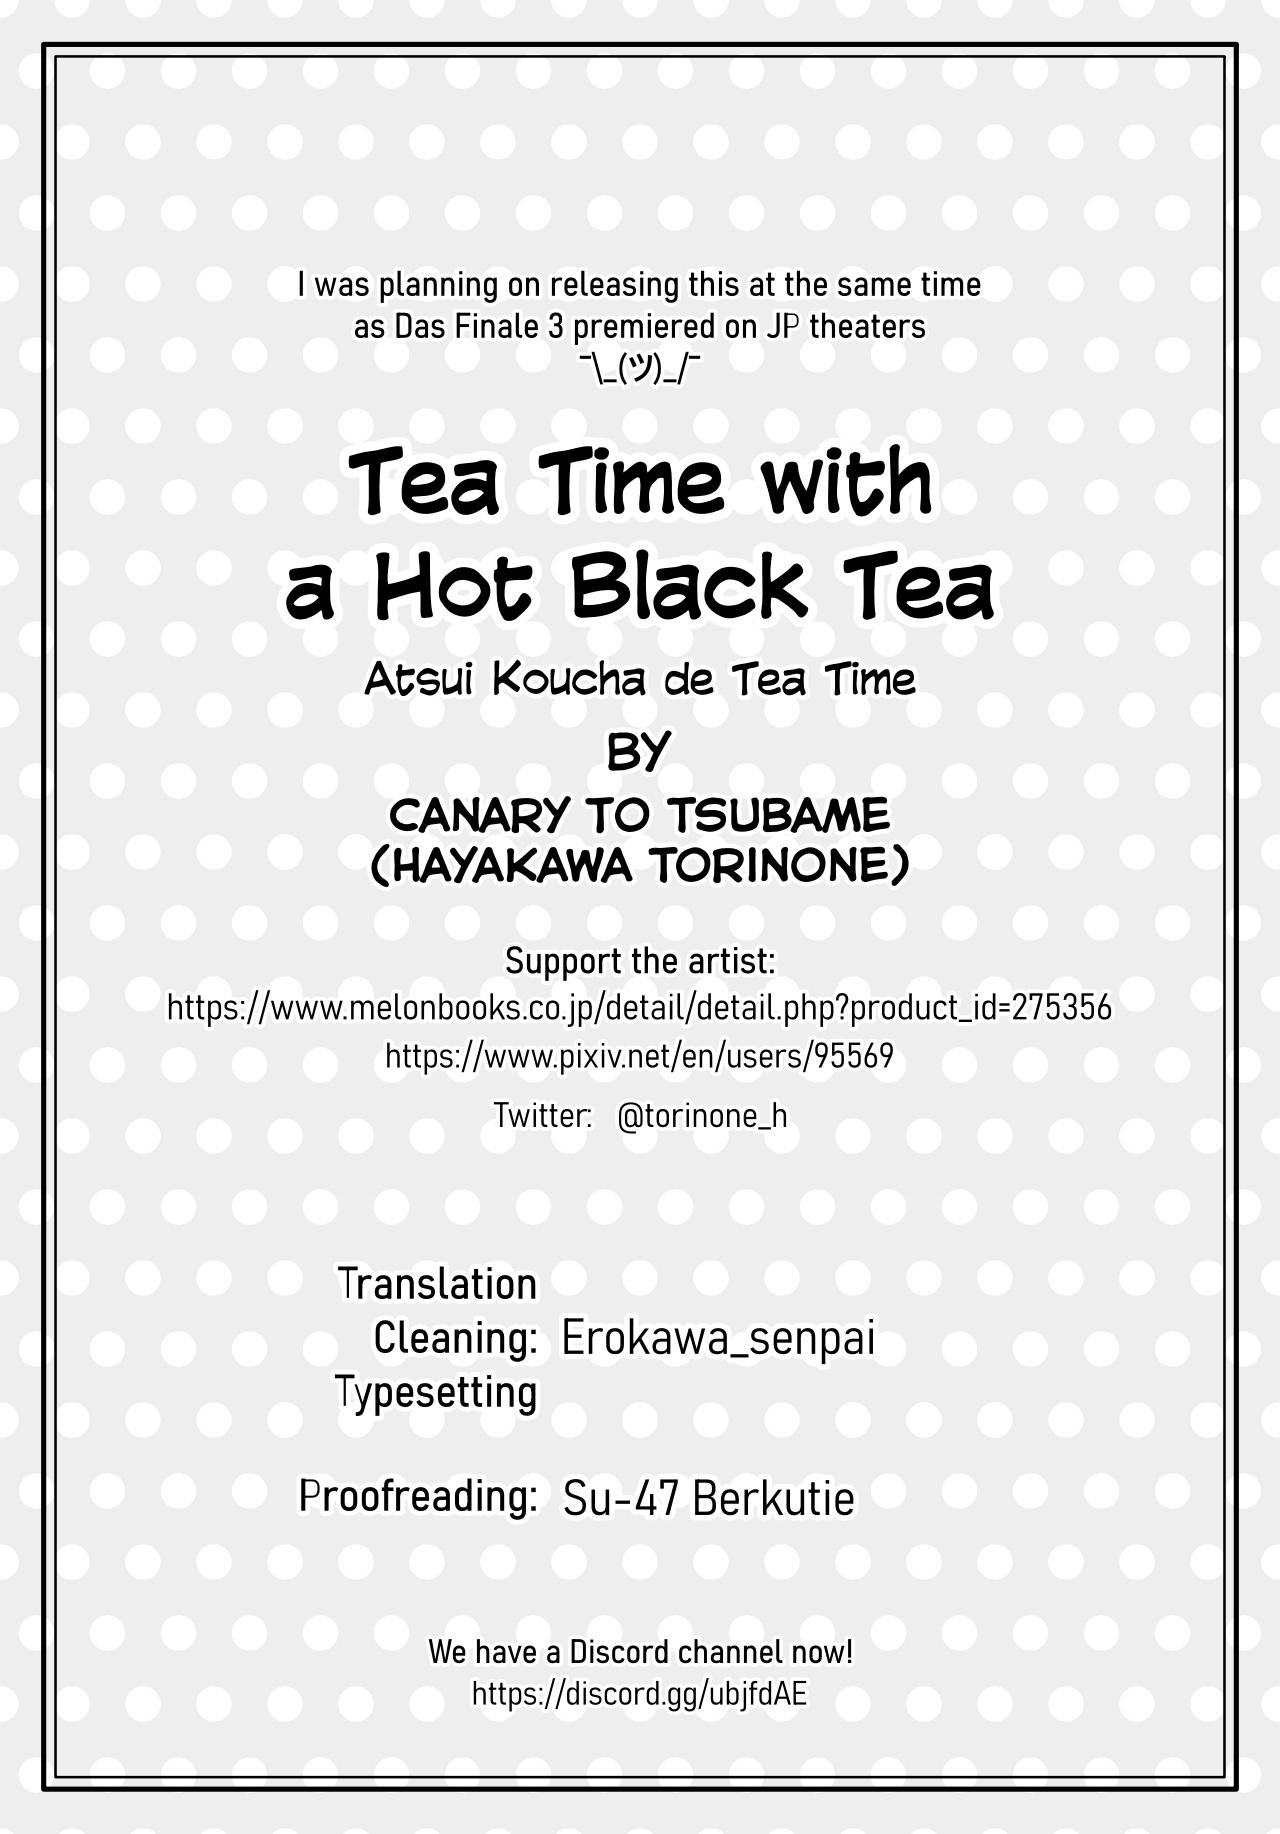 Atsui Koucha de Tea Time   Tea Time with a Hot Black Tea 26